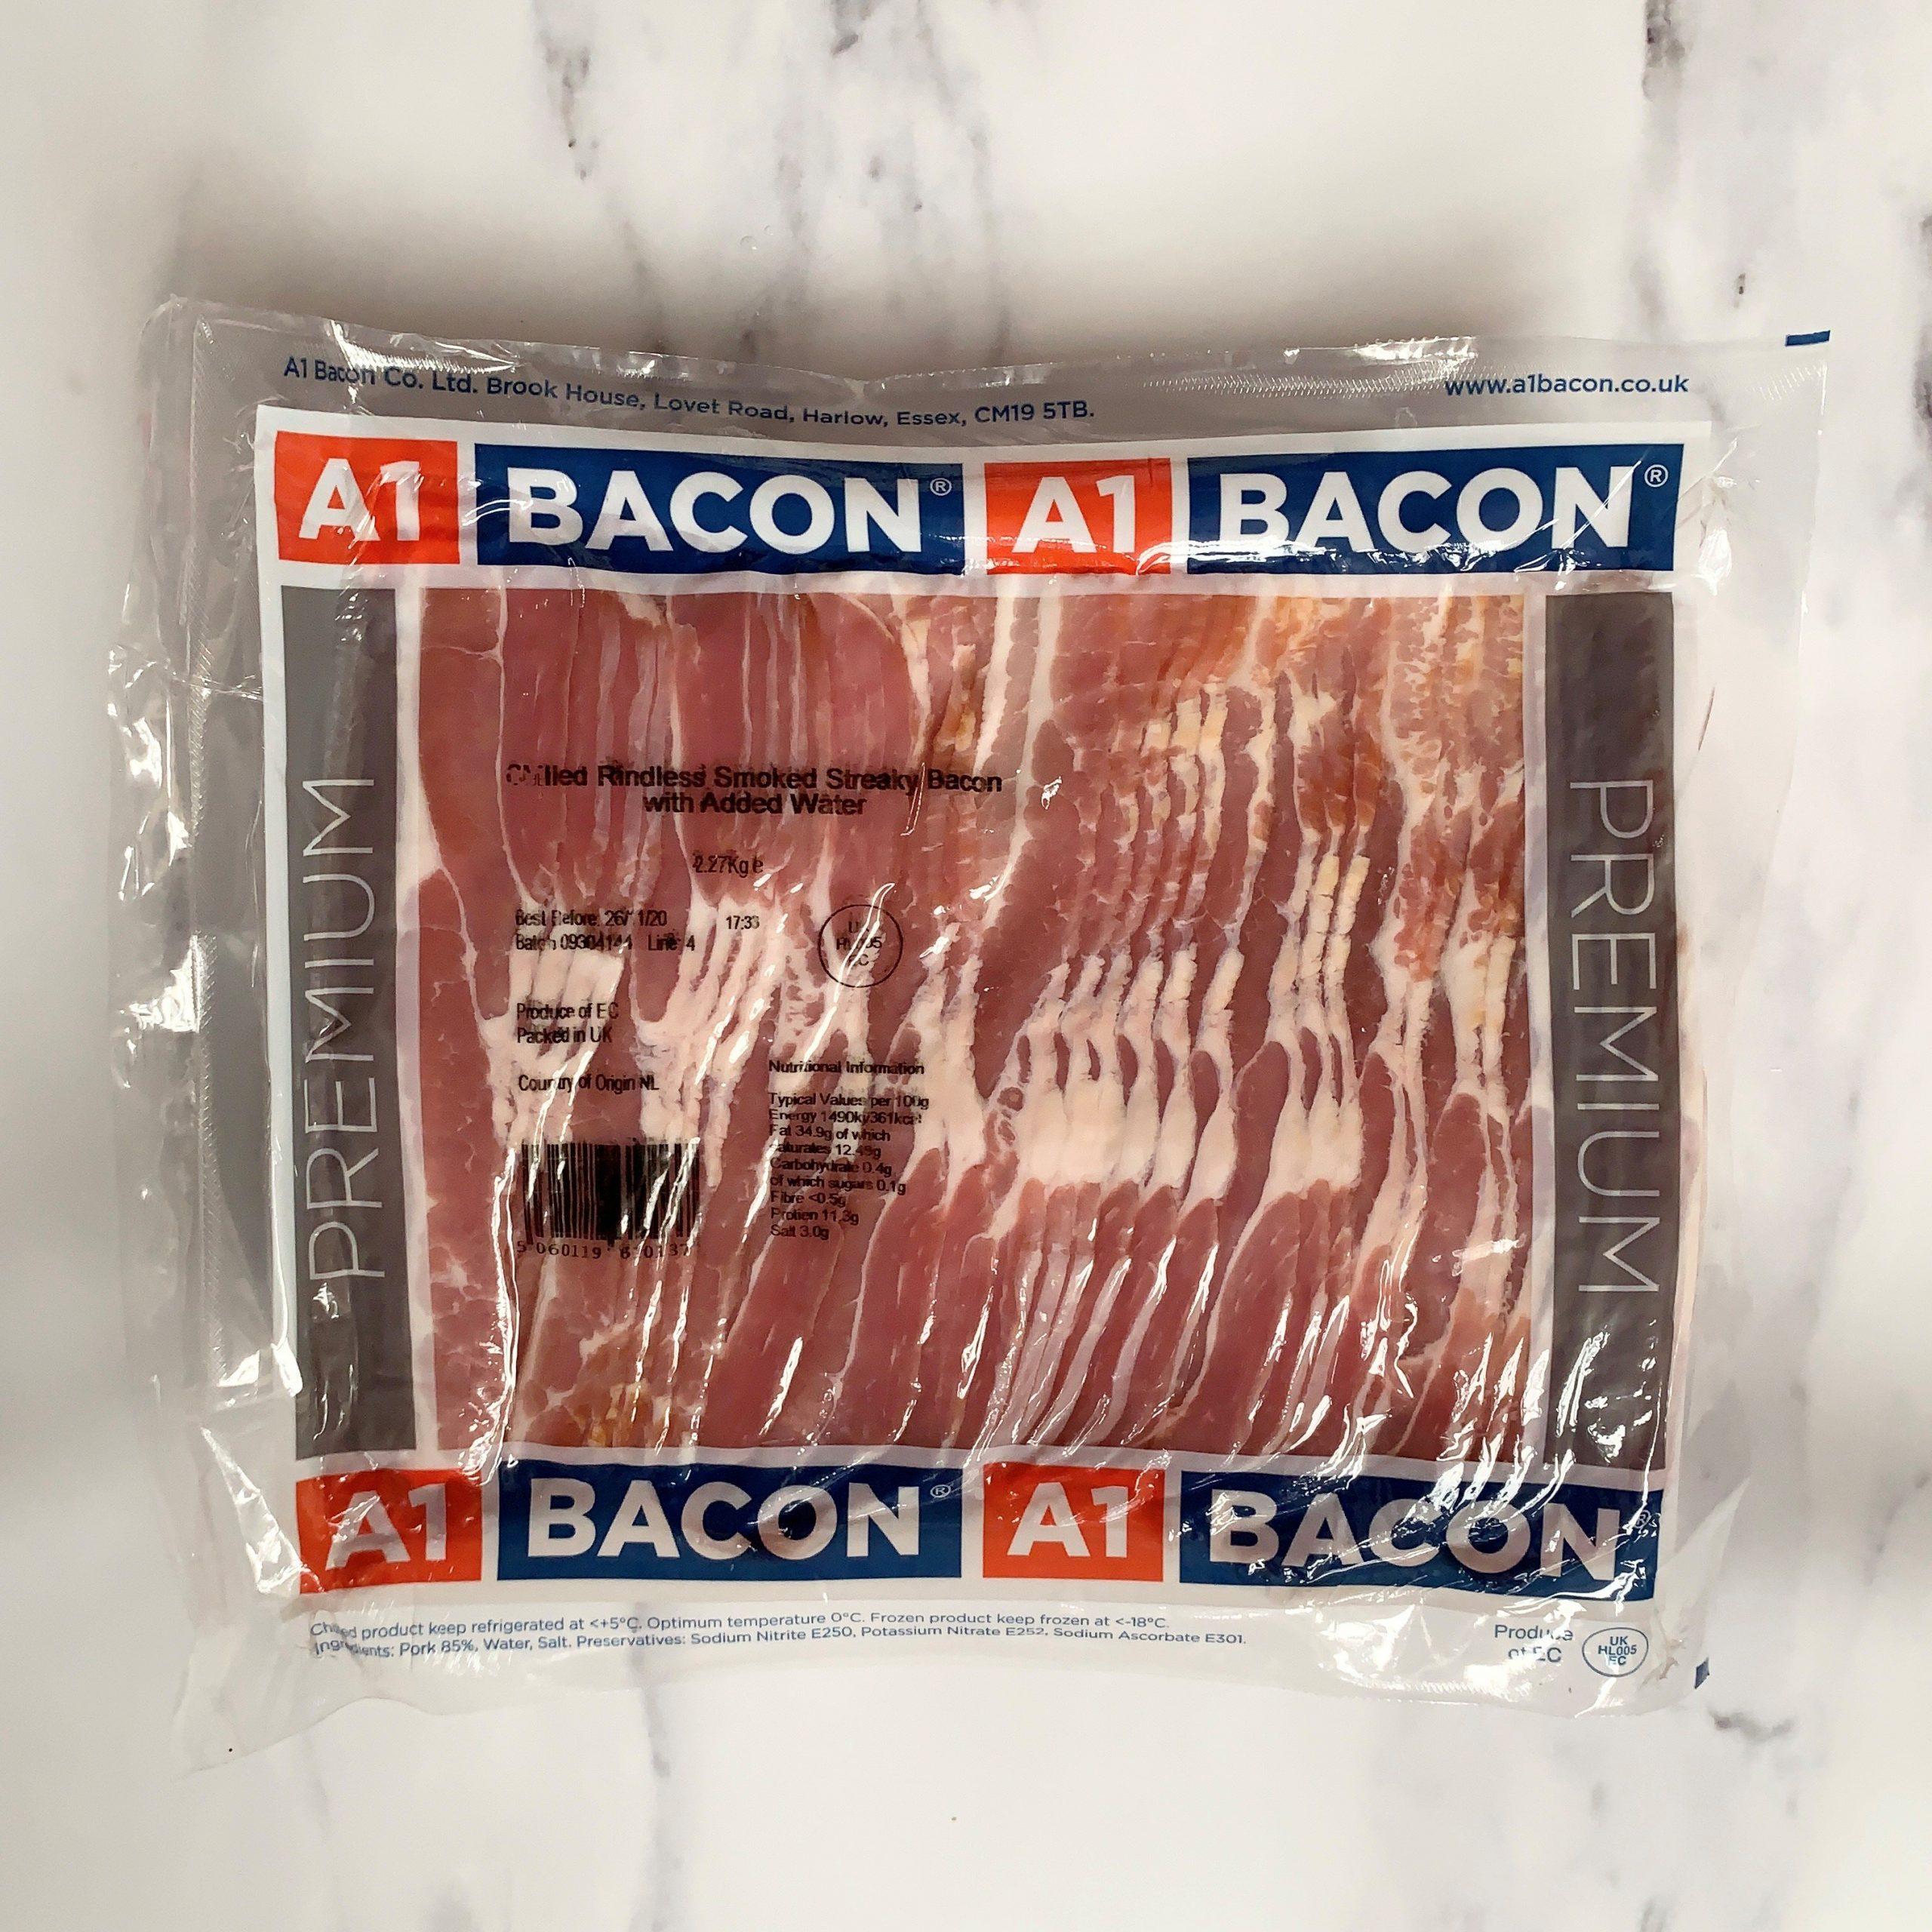 A1 Smoked Streaky Bacon – 2.27kg